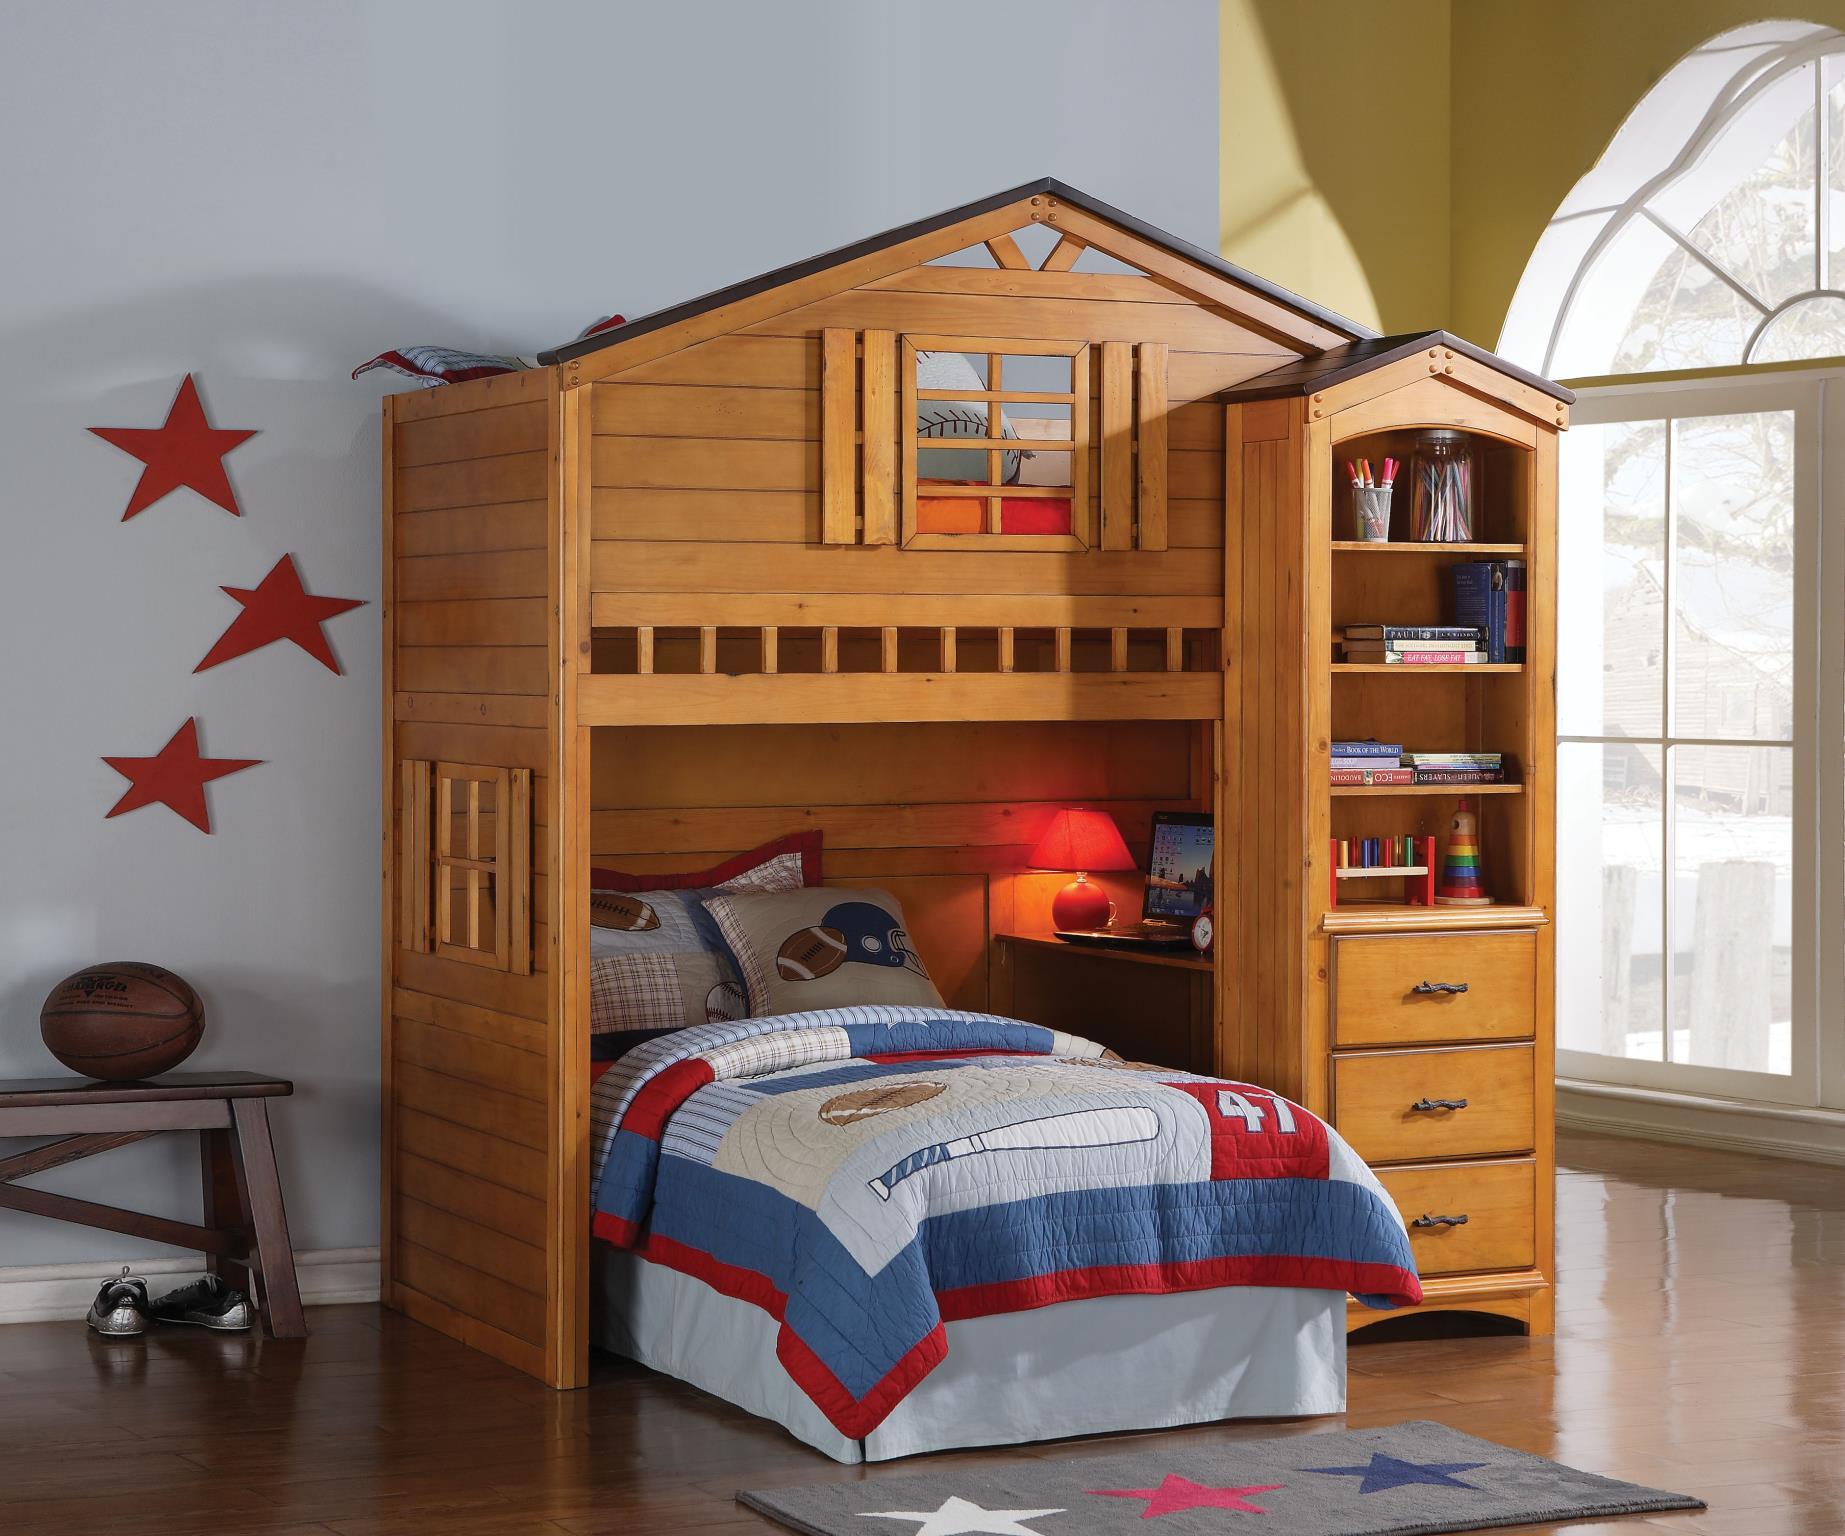 Treehouse Loft Bunk Bed